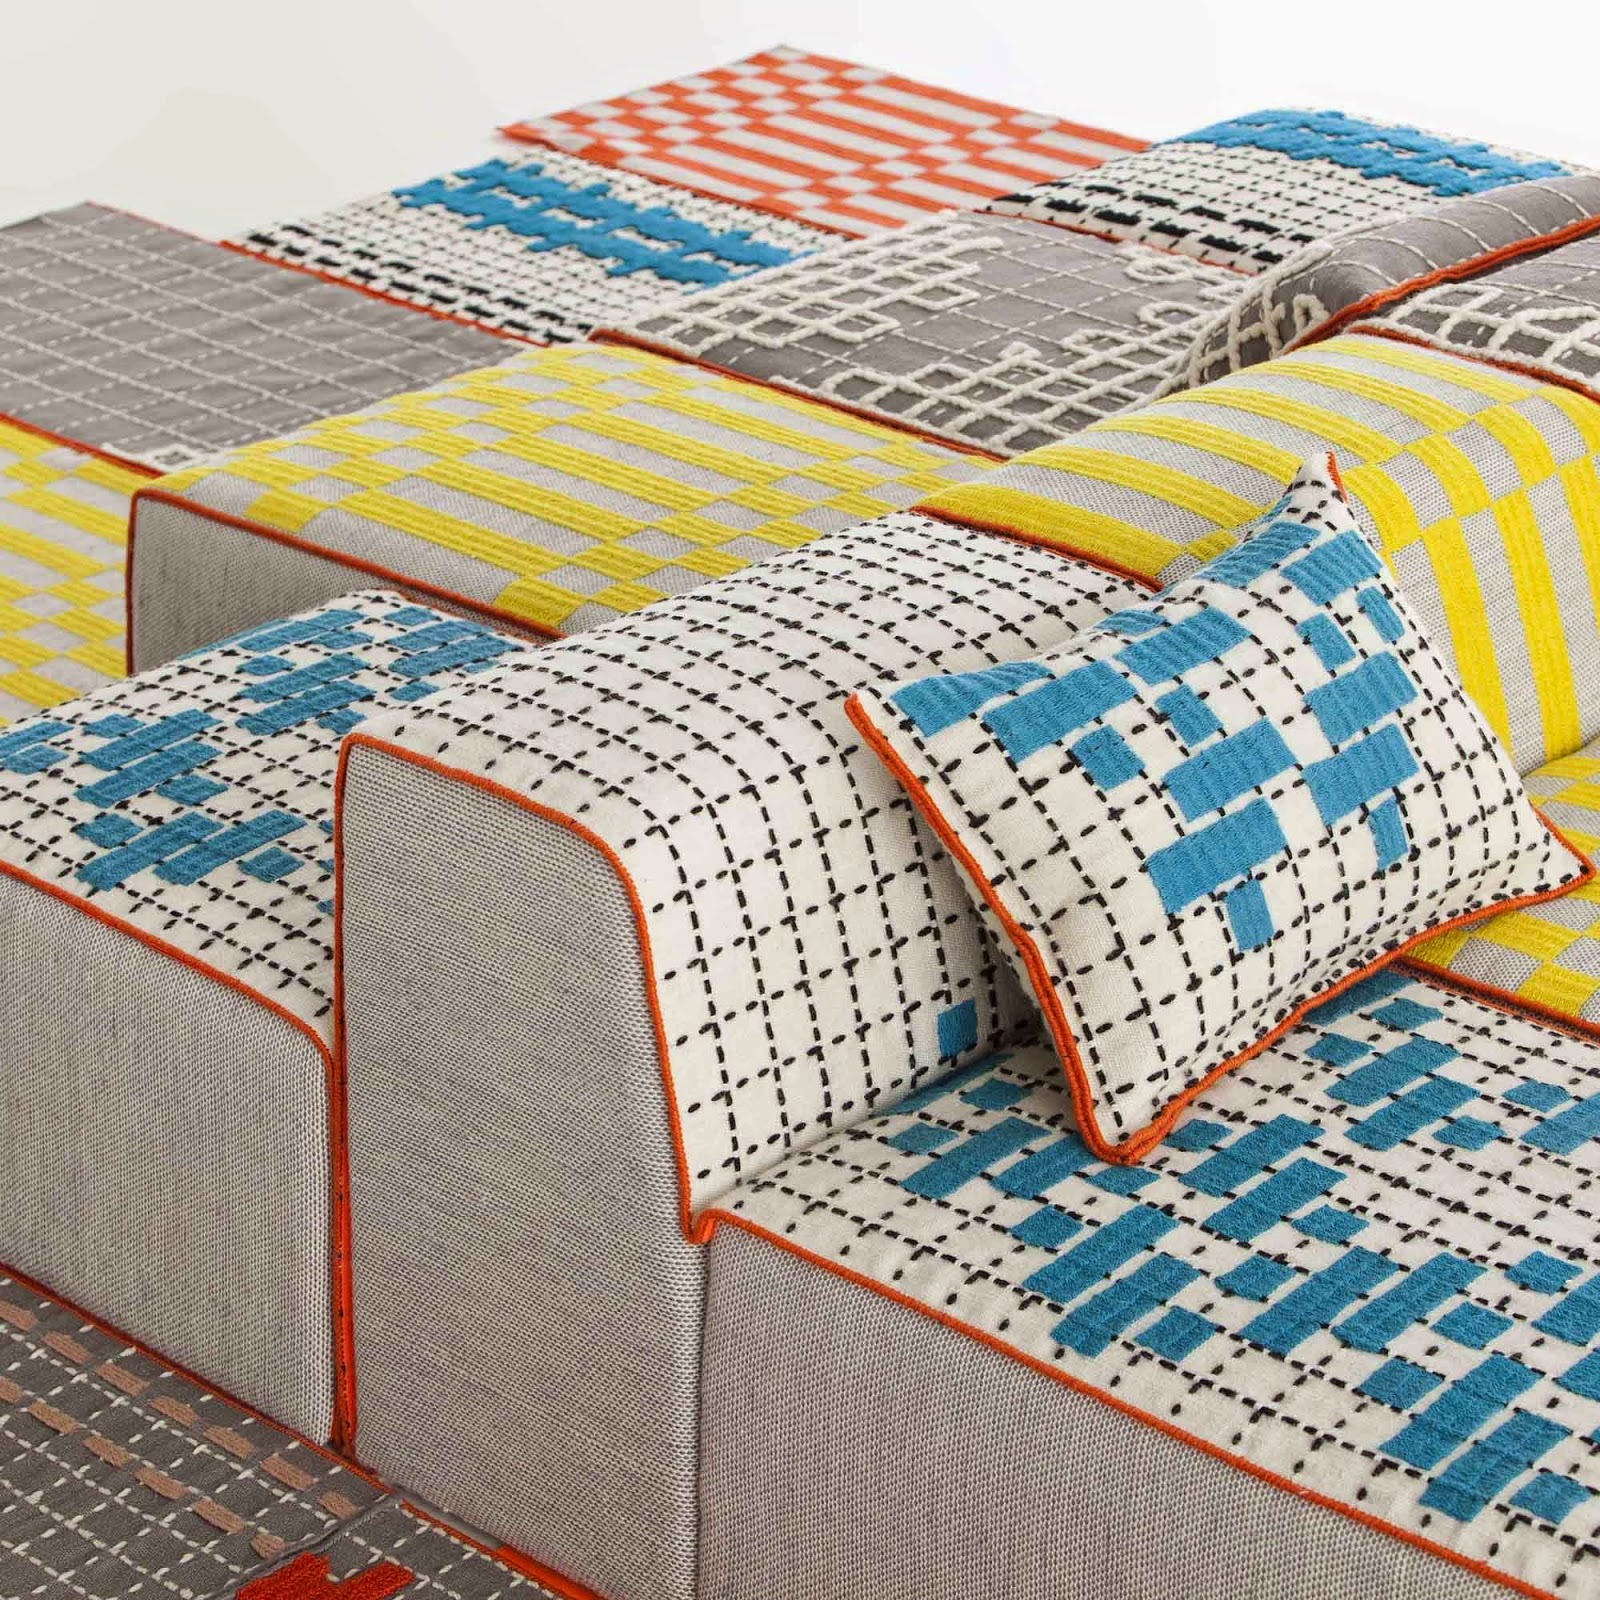 BANDAS carpet, module and ottoman